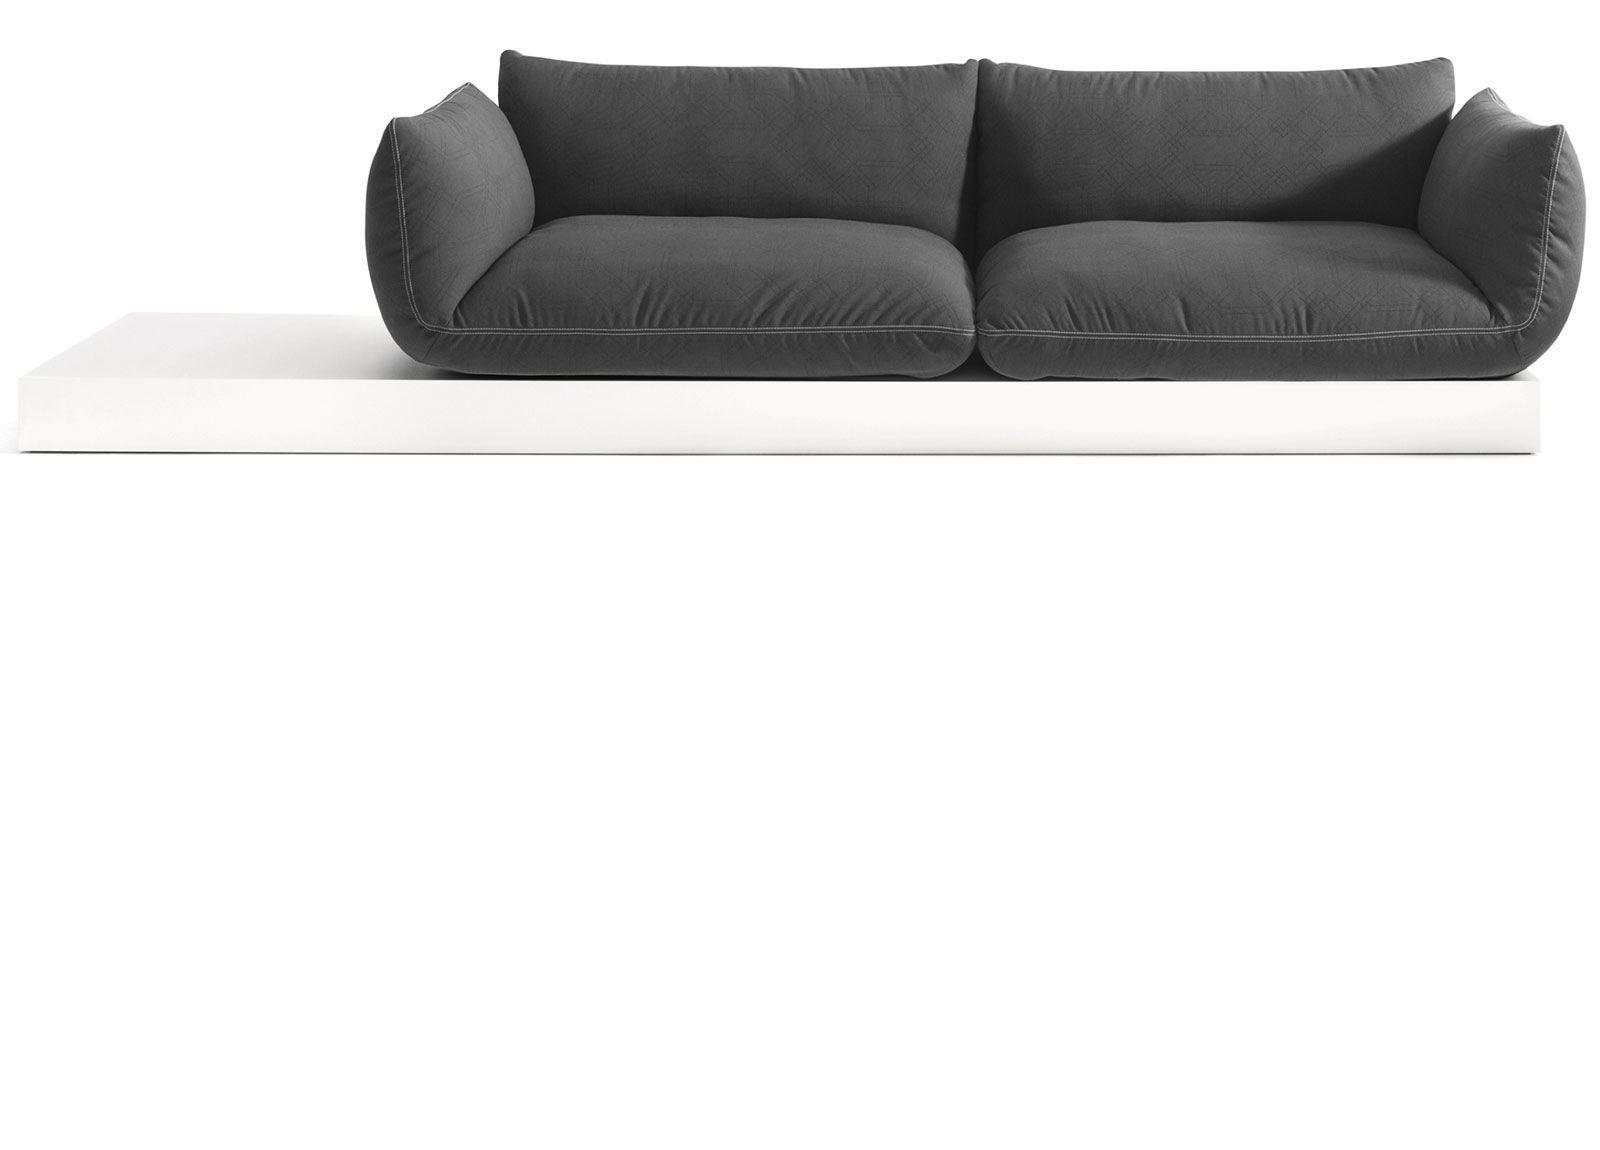 Jalis sofa cor ideen f r ni m bel sofa sofa und m bel for Sofa orientalischer stil